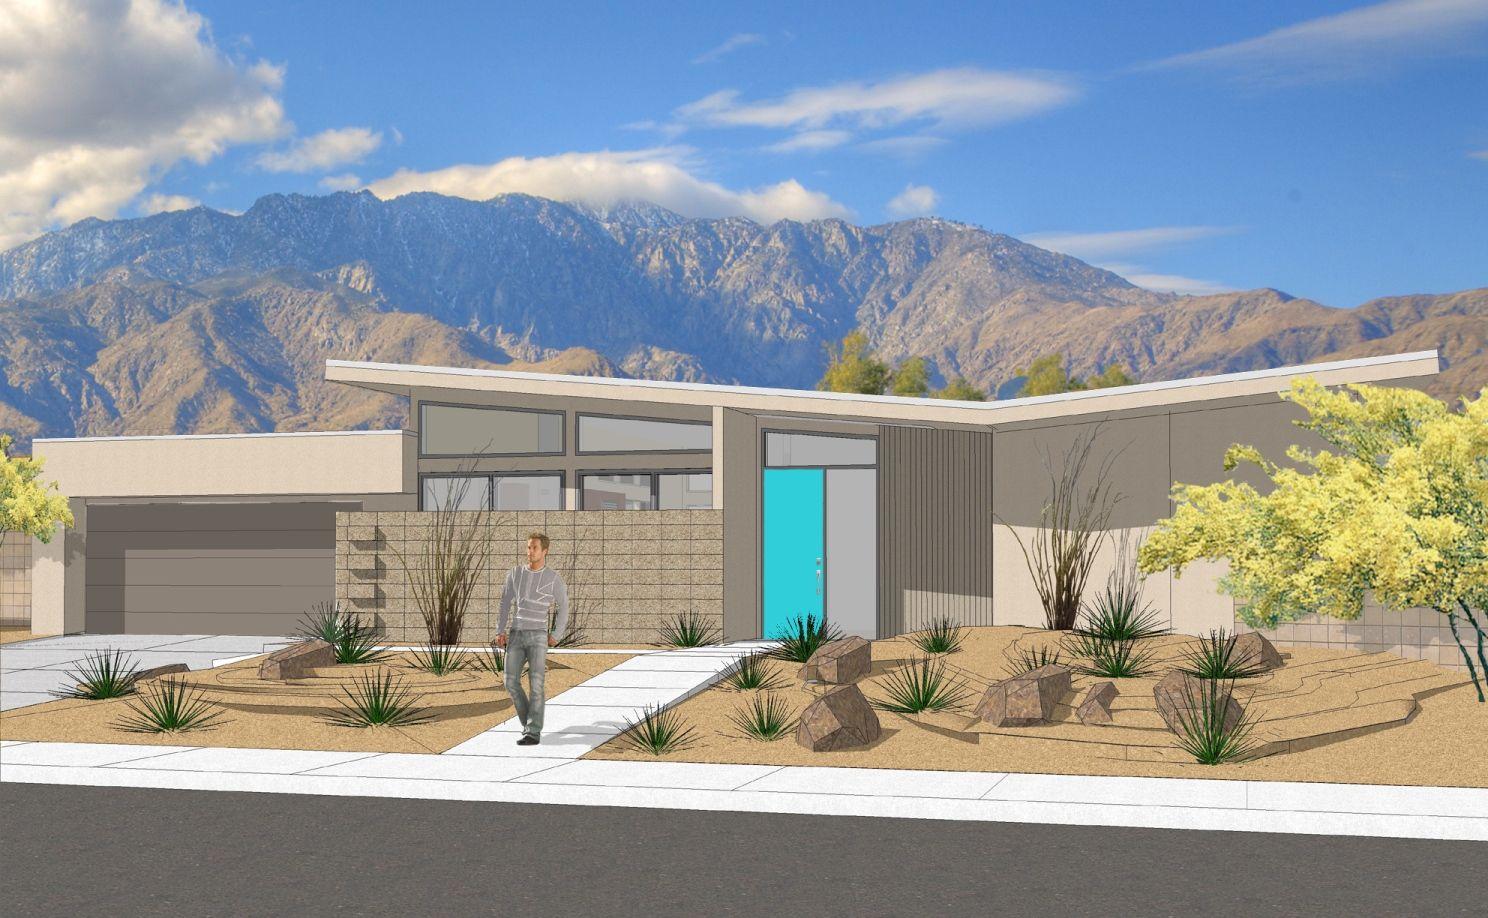 Pin By Tazreen Tasnim On Inspiration 2 Mid Century Modern House